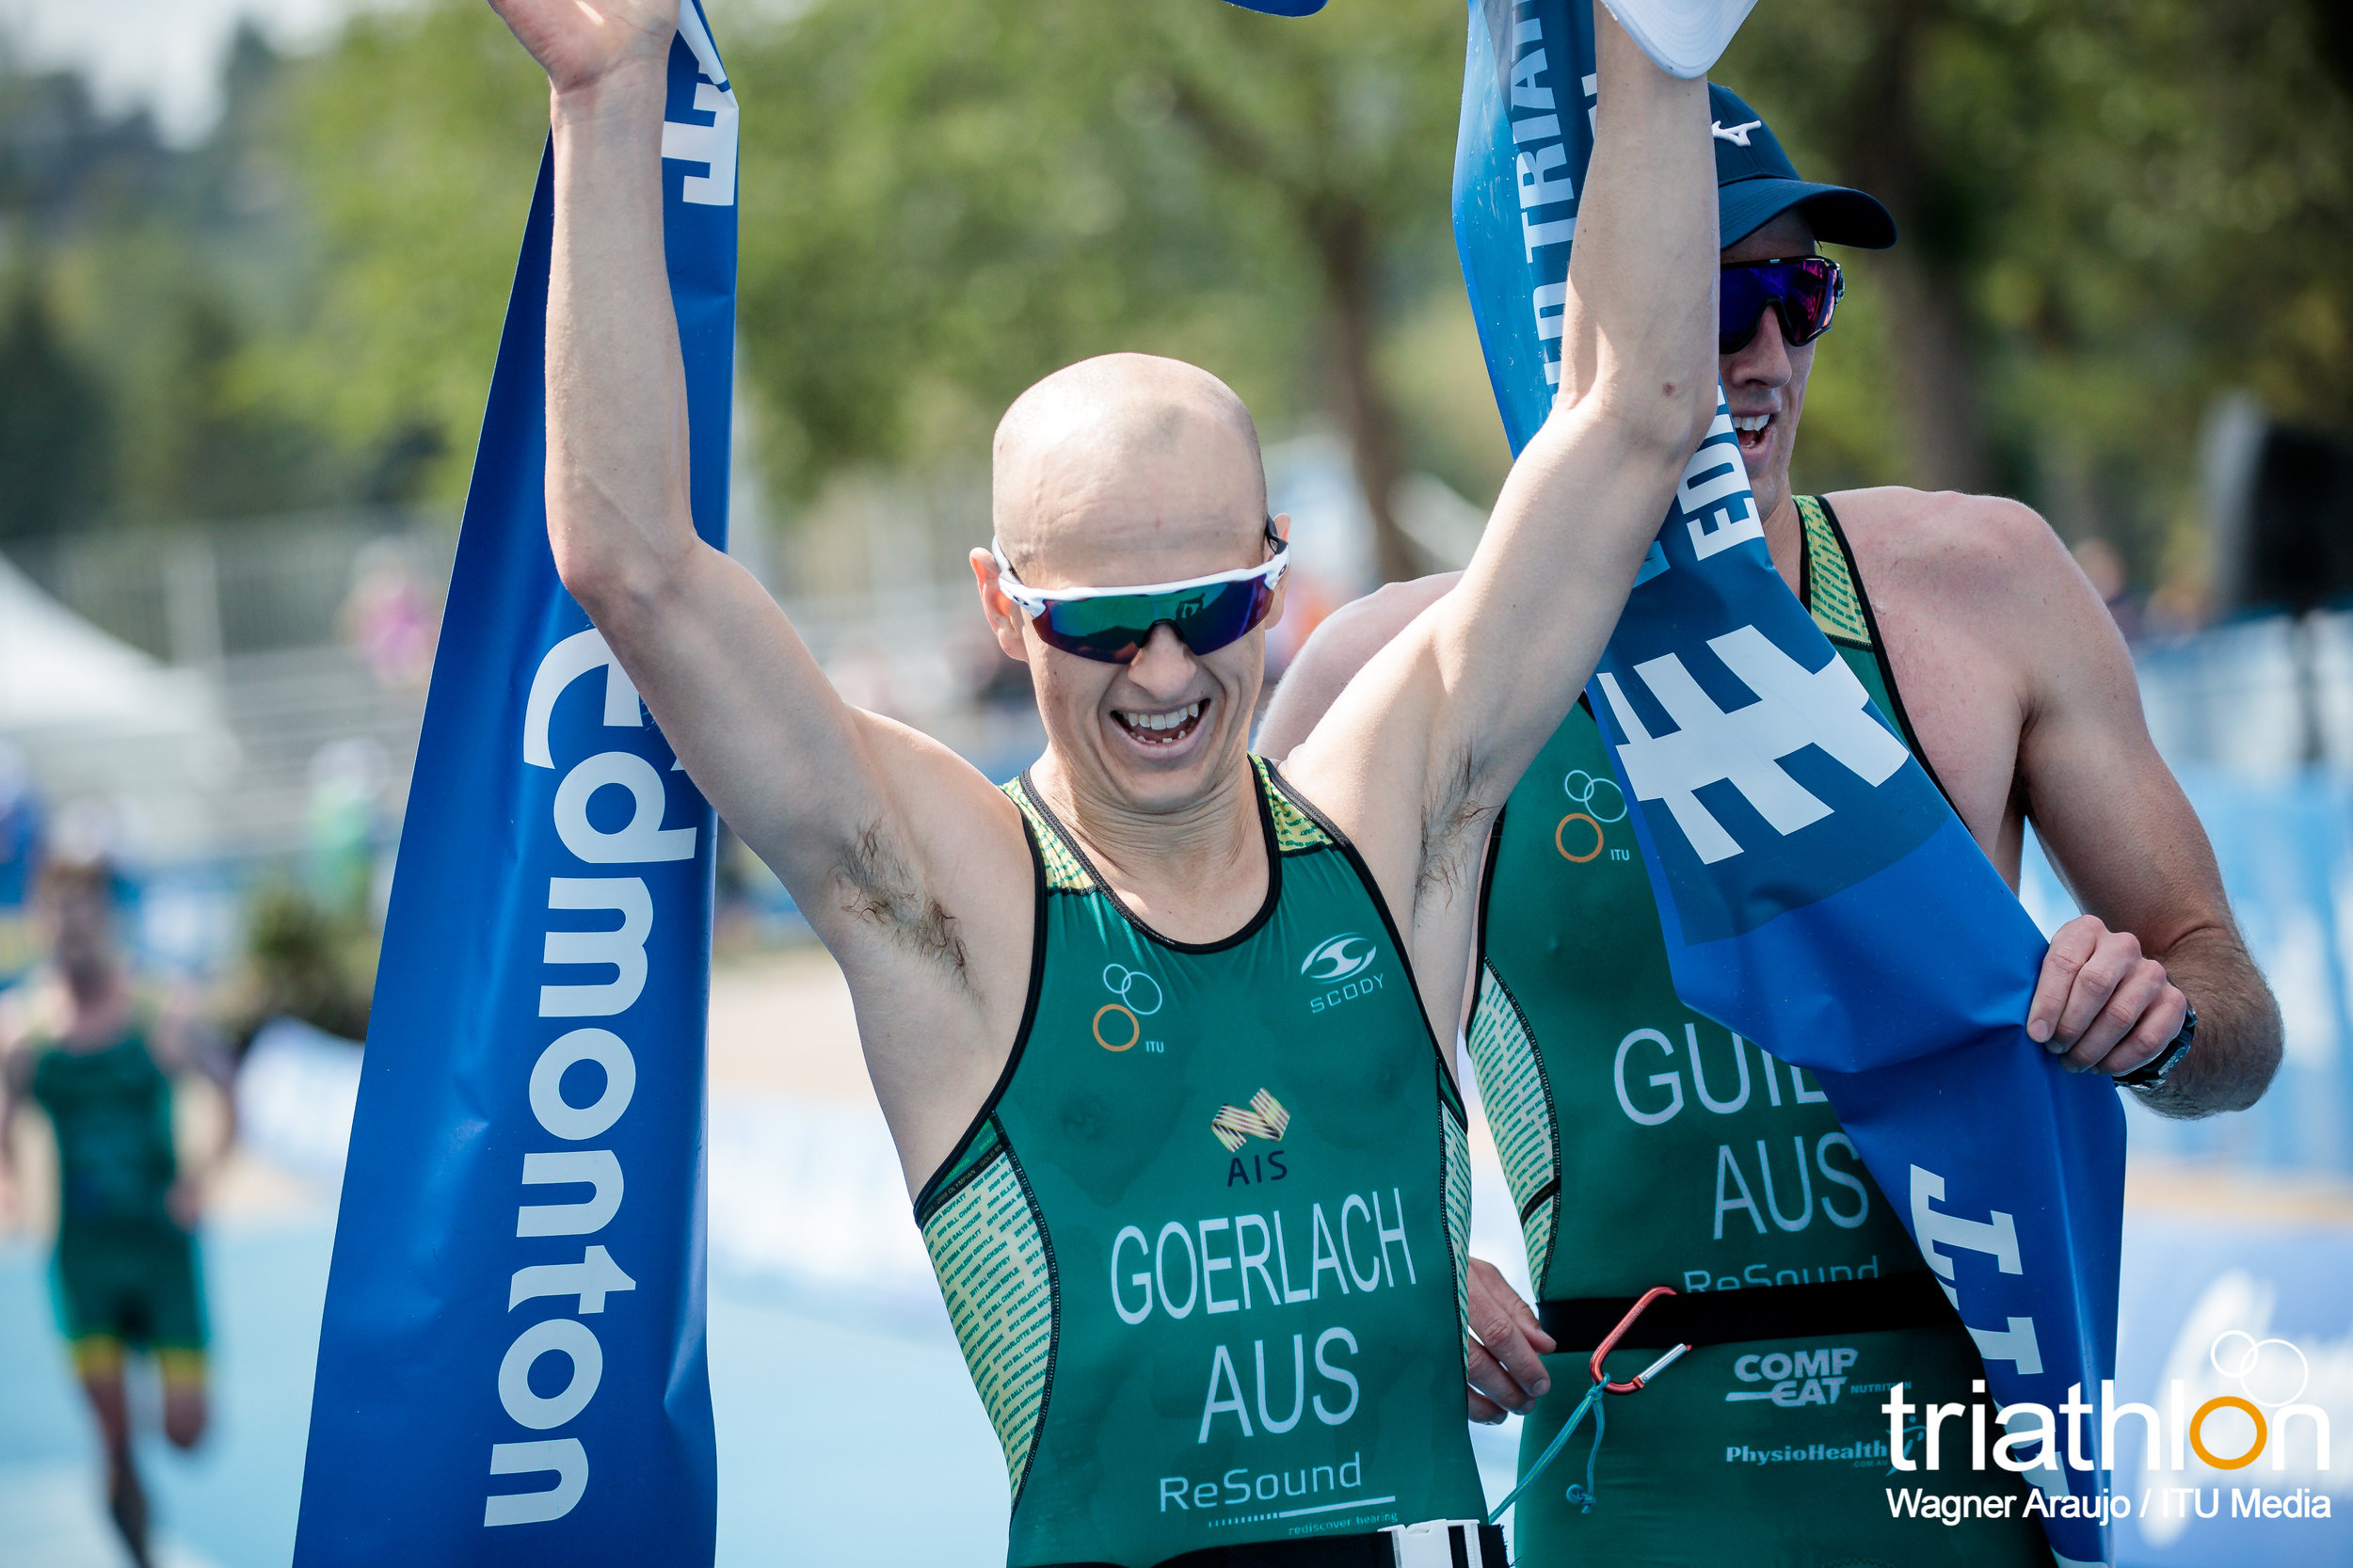 Jonathan Goerlach's incredible journey to glory in Edmonton